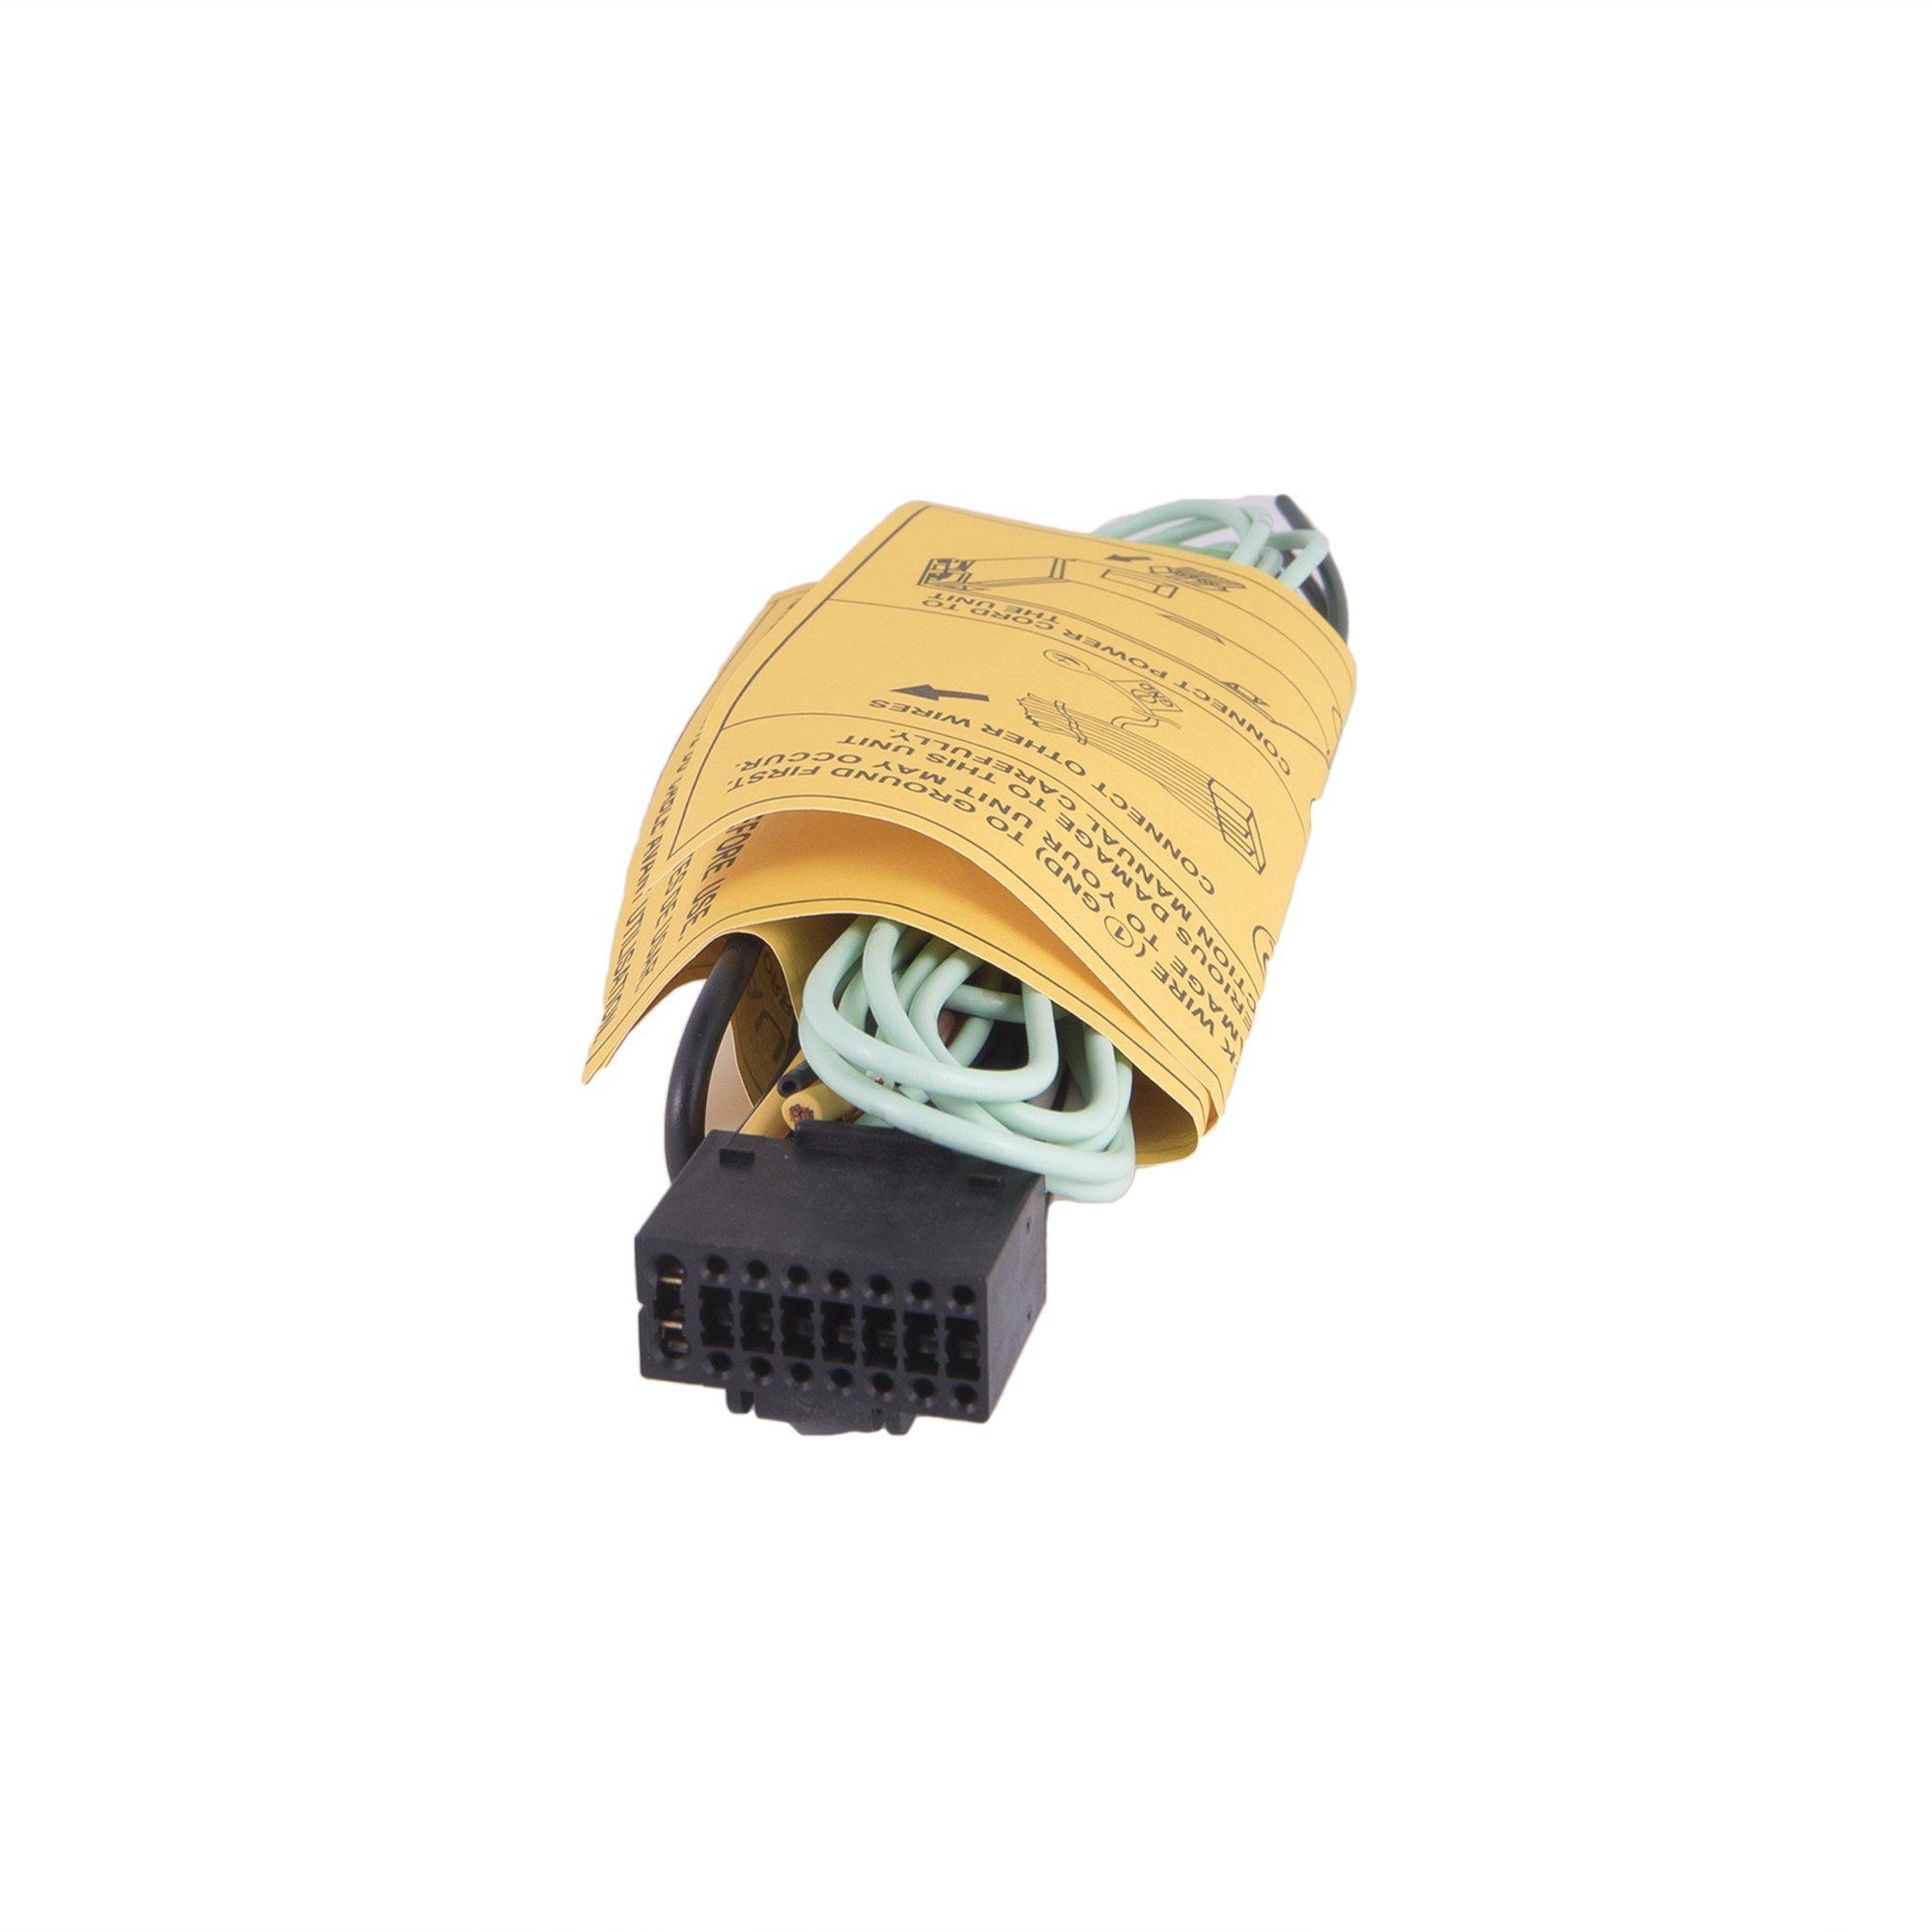 JVC KW-NT30HD KW-NT3HDT KW-NT50HDT OEM Genuine Wire Harness